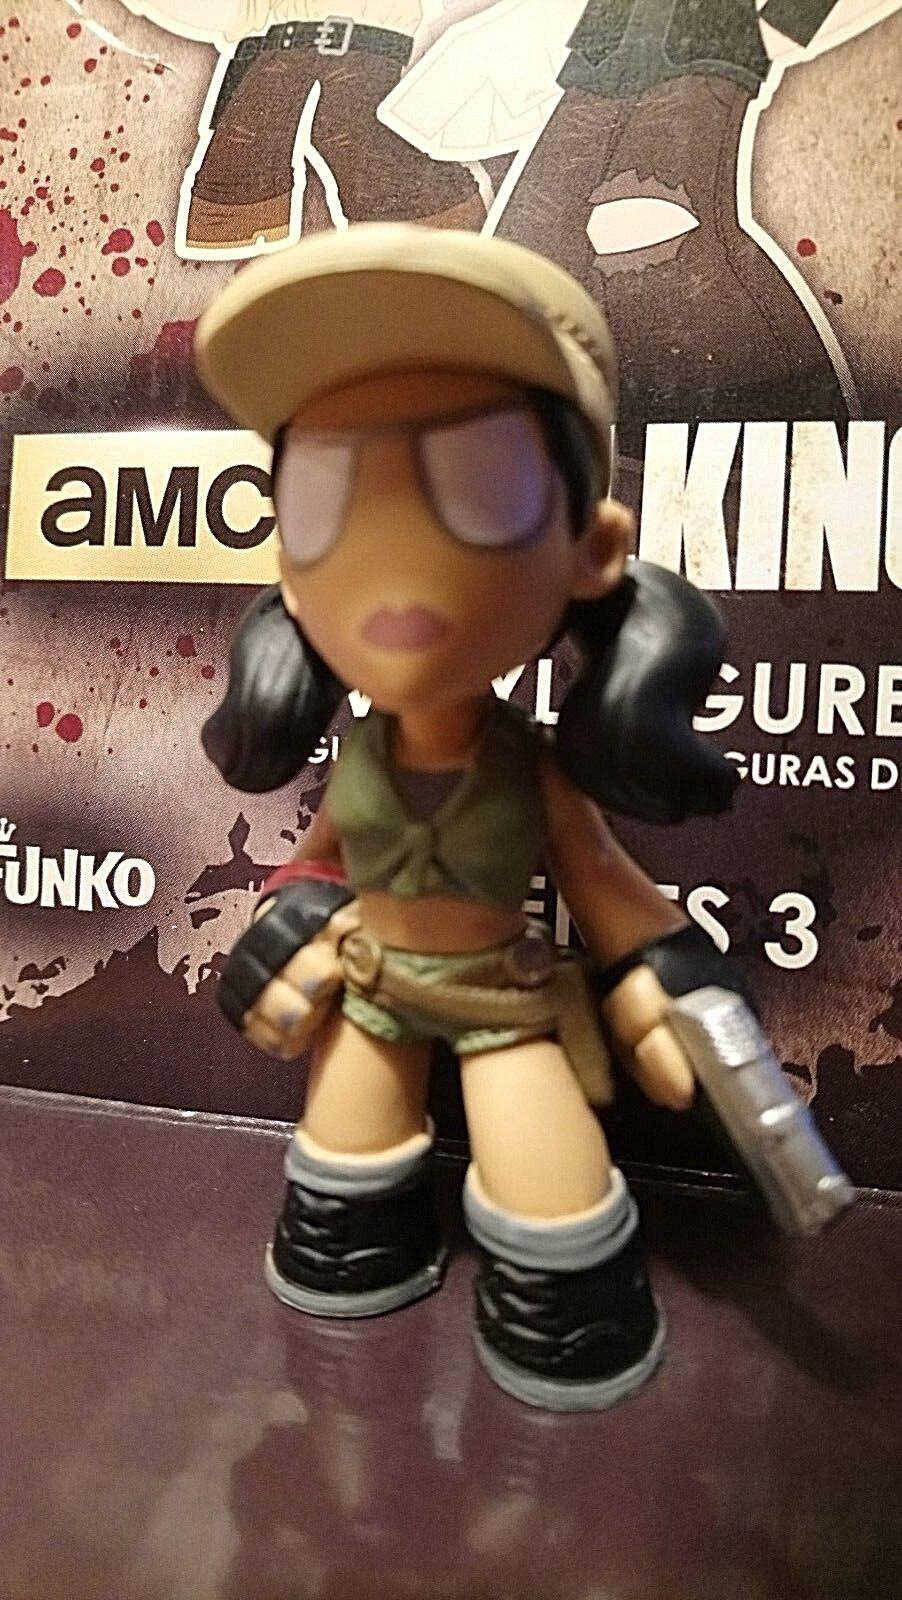 aquí tiene la última The Walking Walking Walking Dead FUNKO Misterio Mini serie 3 ROSITA HOT TOPIC Raro  seguro de calidad